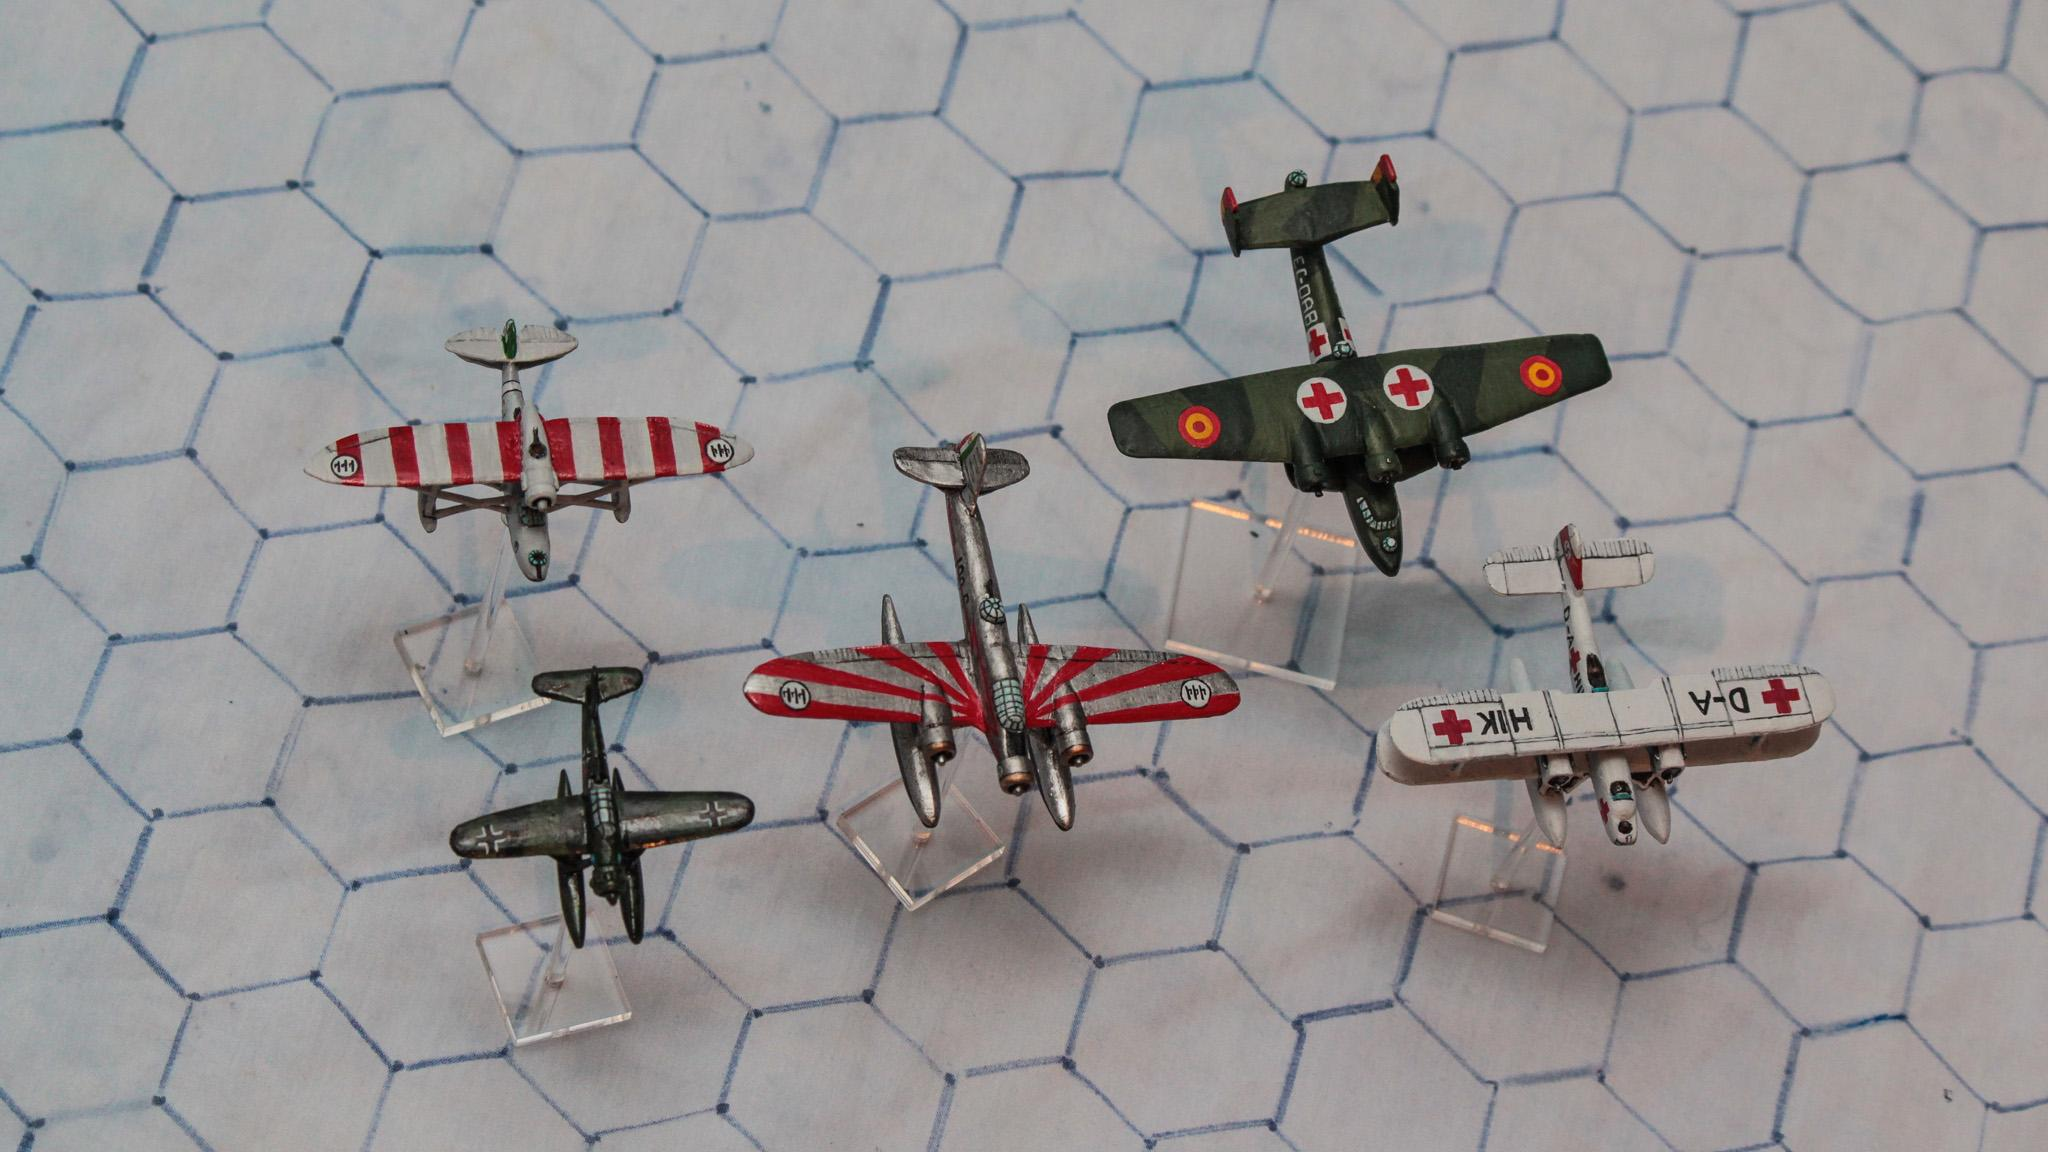 1:300 Scale, 6mm Scale, Air Combat, Flying Boats, Germans, Italian, Luftwaffe, Maritime Patrol, Sea Rescue, Seaplane, Seenotdienst, World War 2